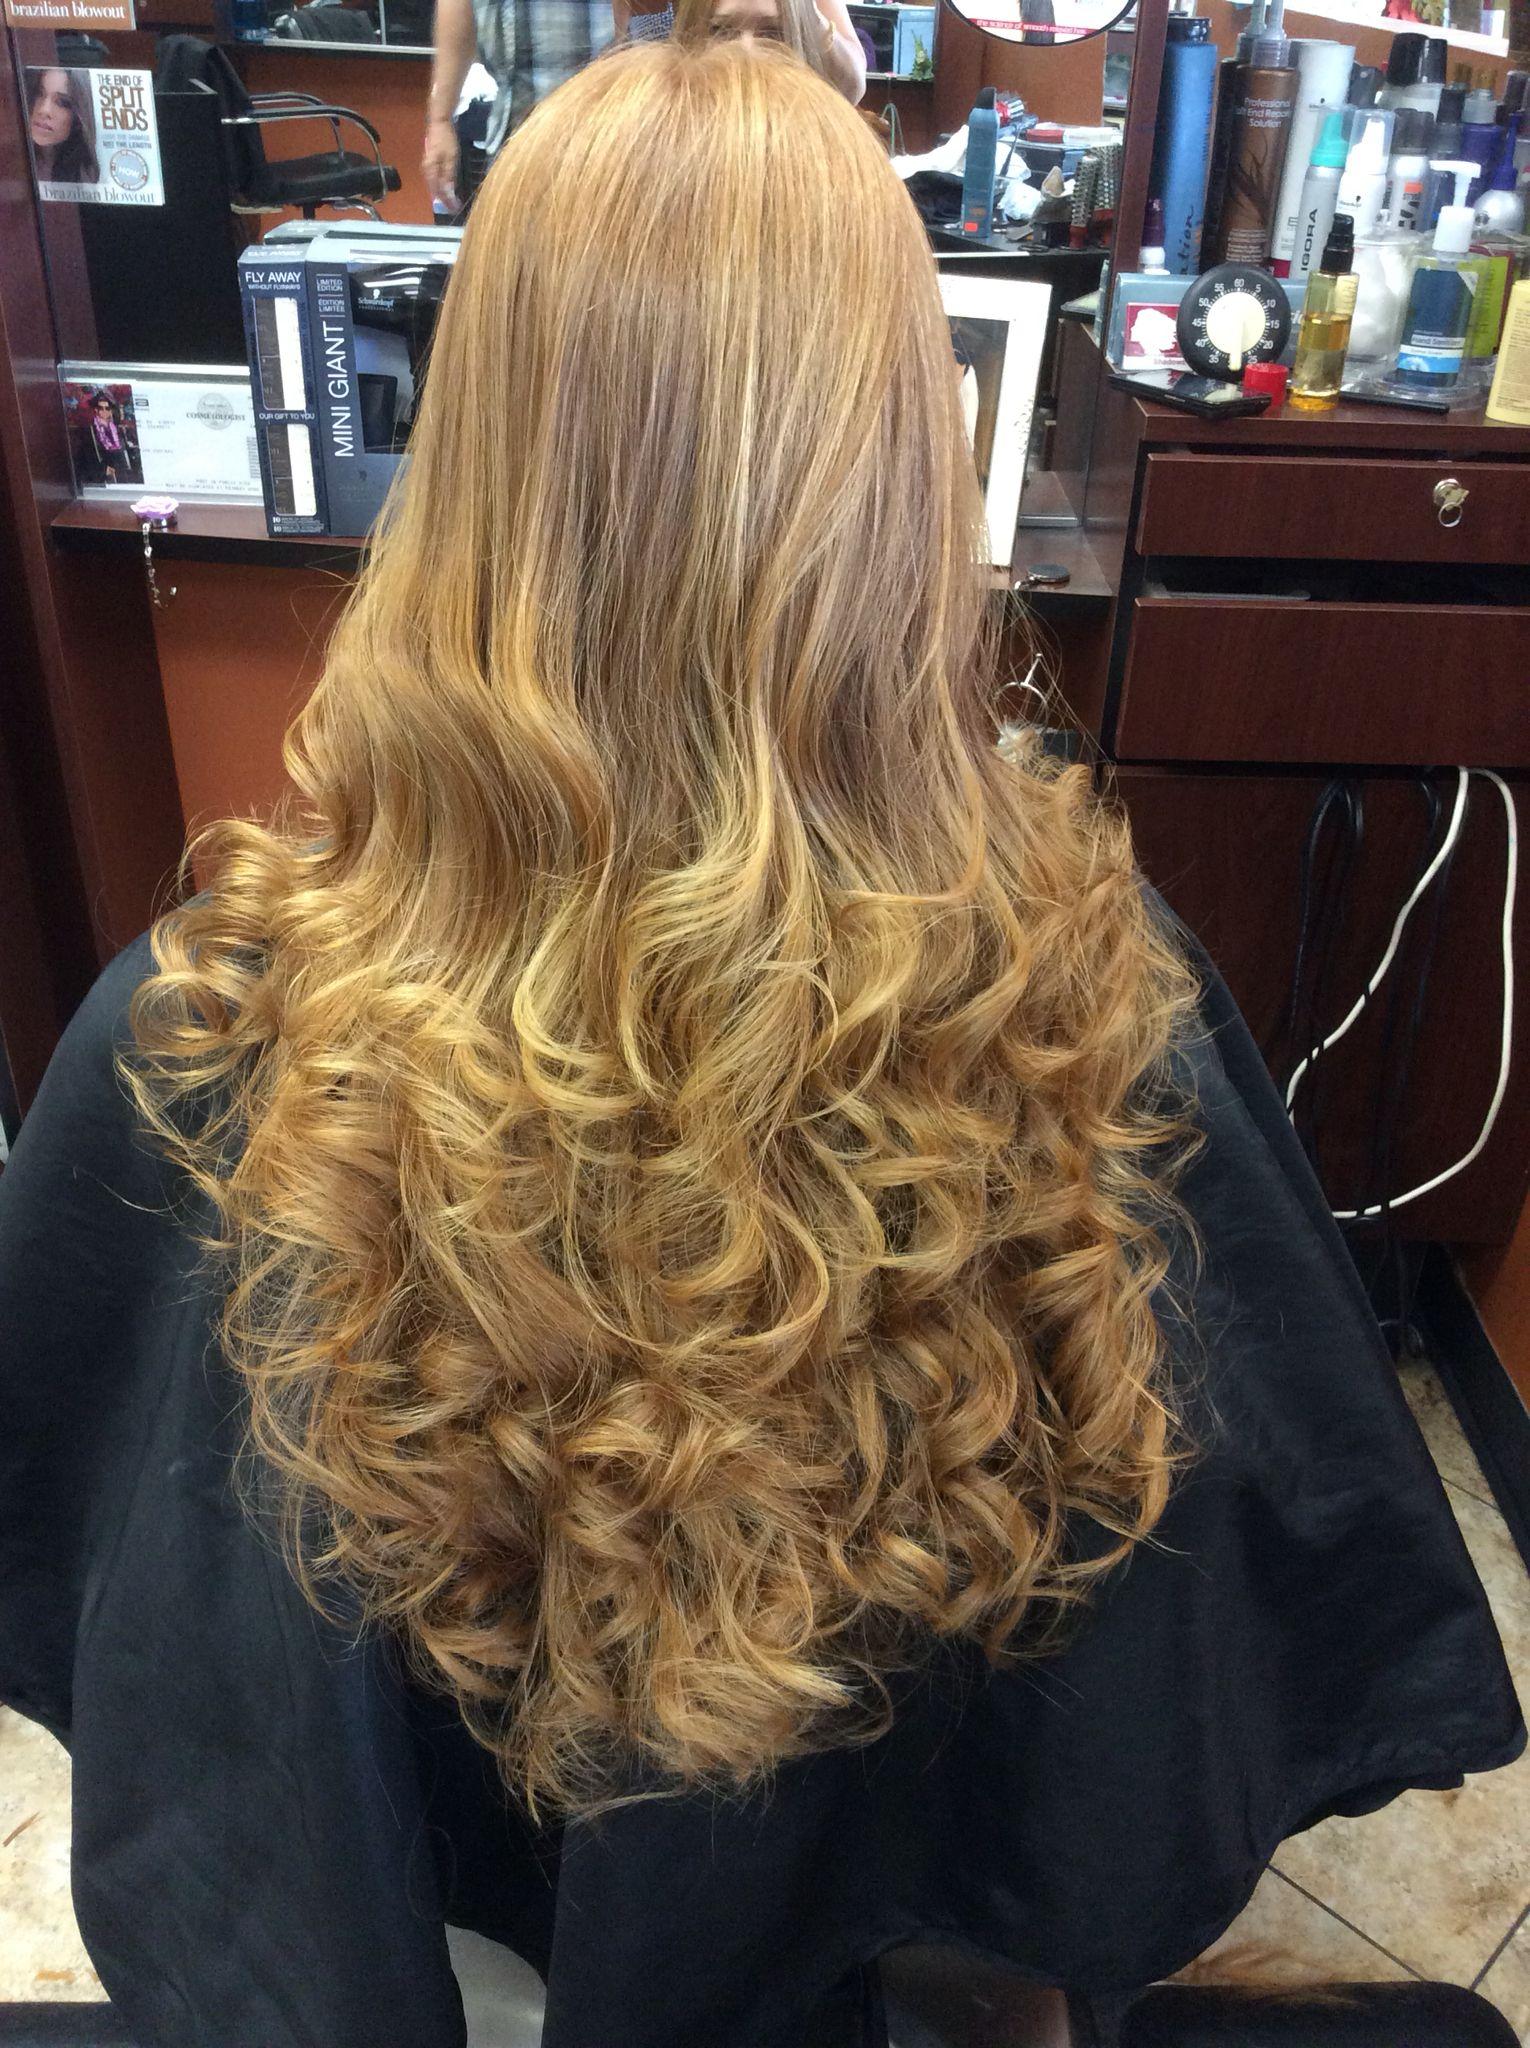 2015 haircuts haircolor in shadows hair salon shadows hair salon 2015 haircuts haircolor in shadows hair salon shadows hair salon irvine ca solutioingenieria Gallery